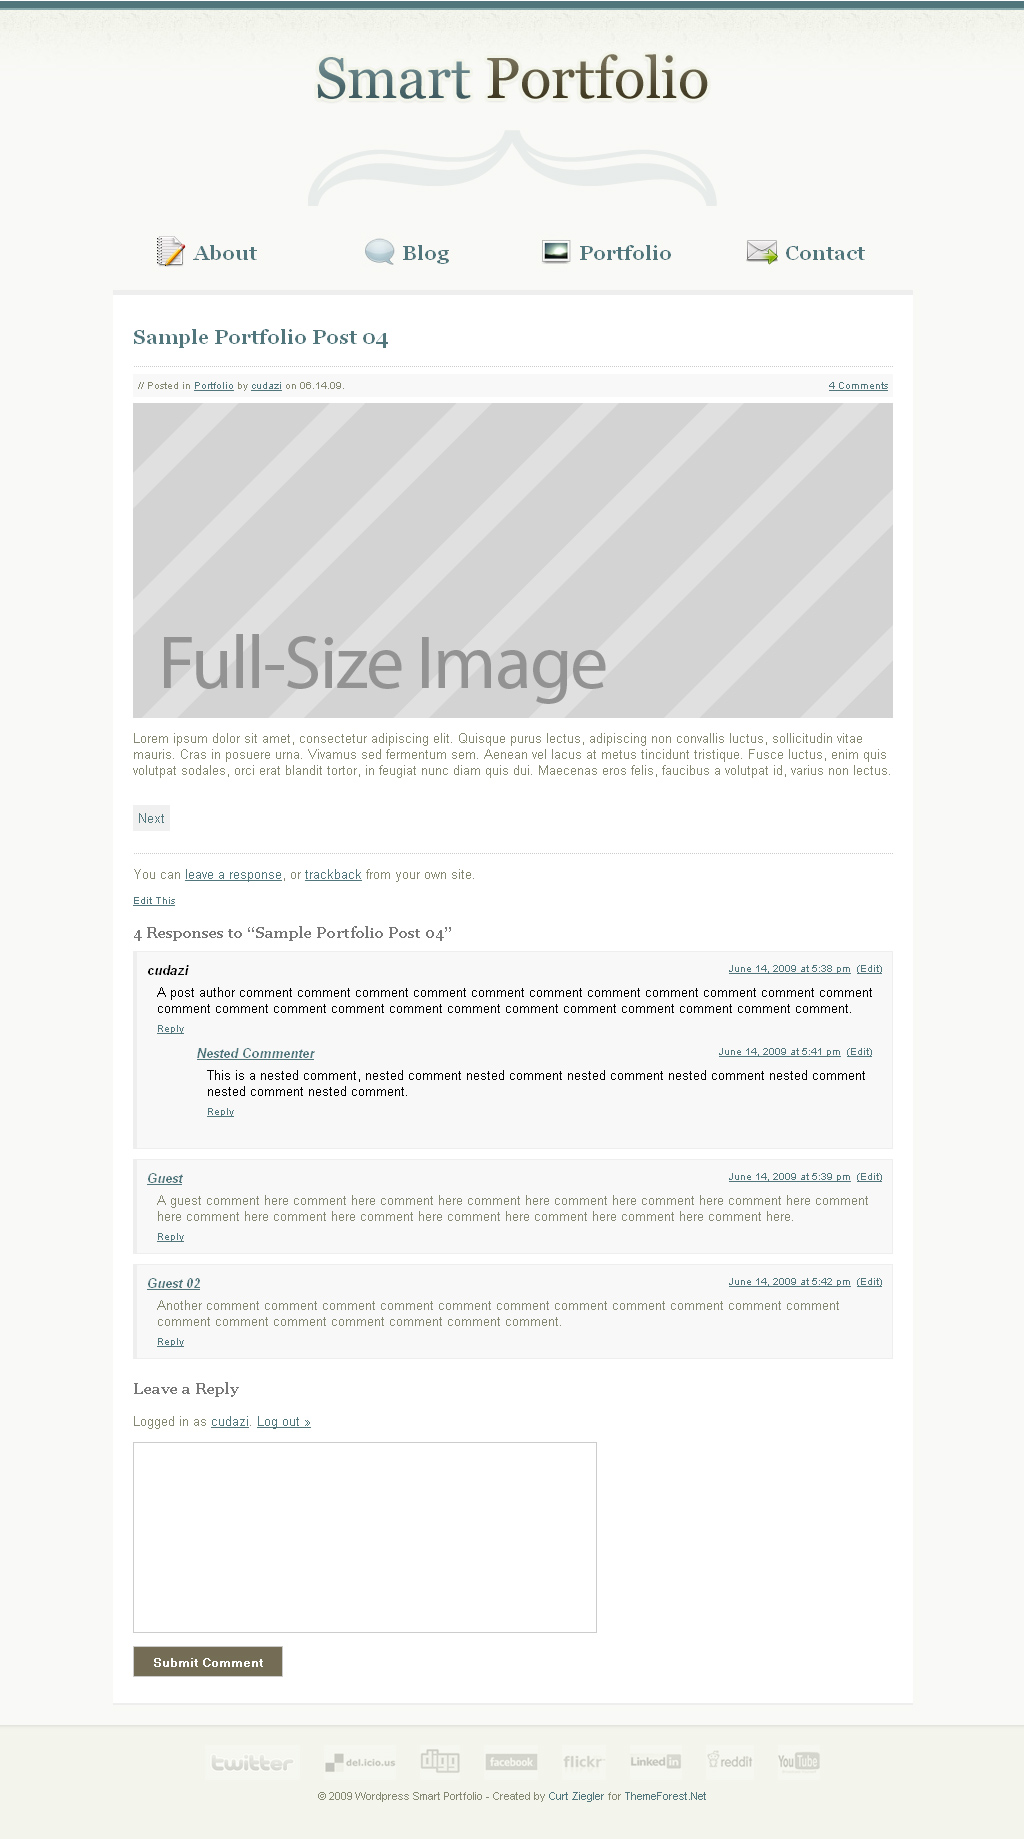 Smart Portfolio - Wordpress Edition